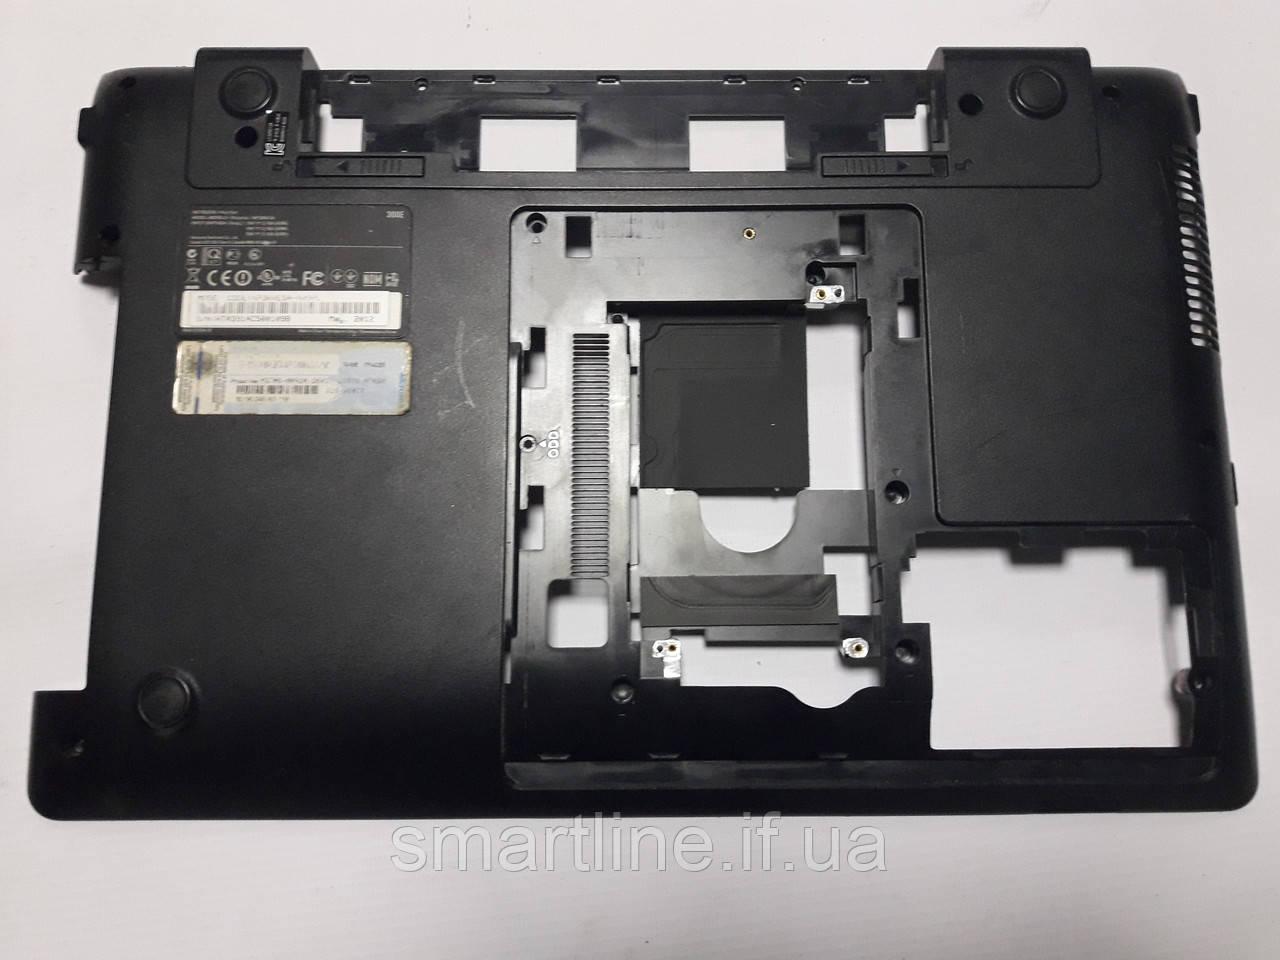 Нижня частина корпусу для ноутбука Samsung 300E5